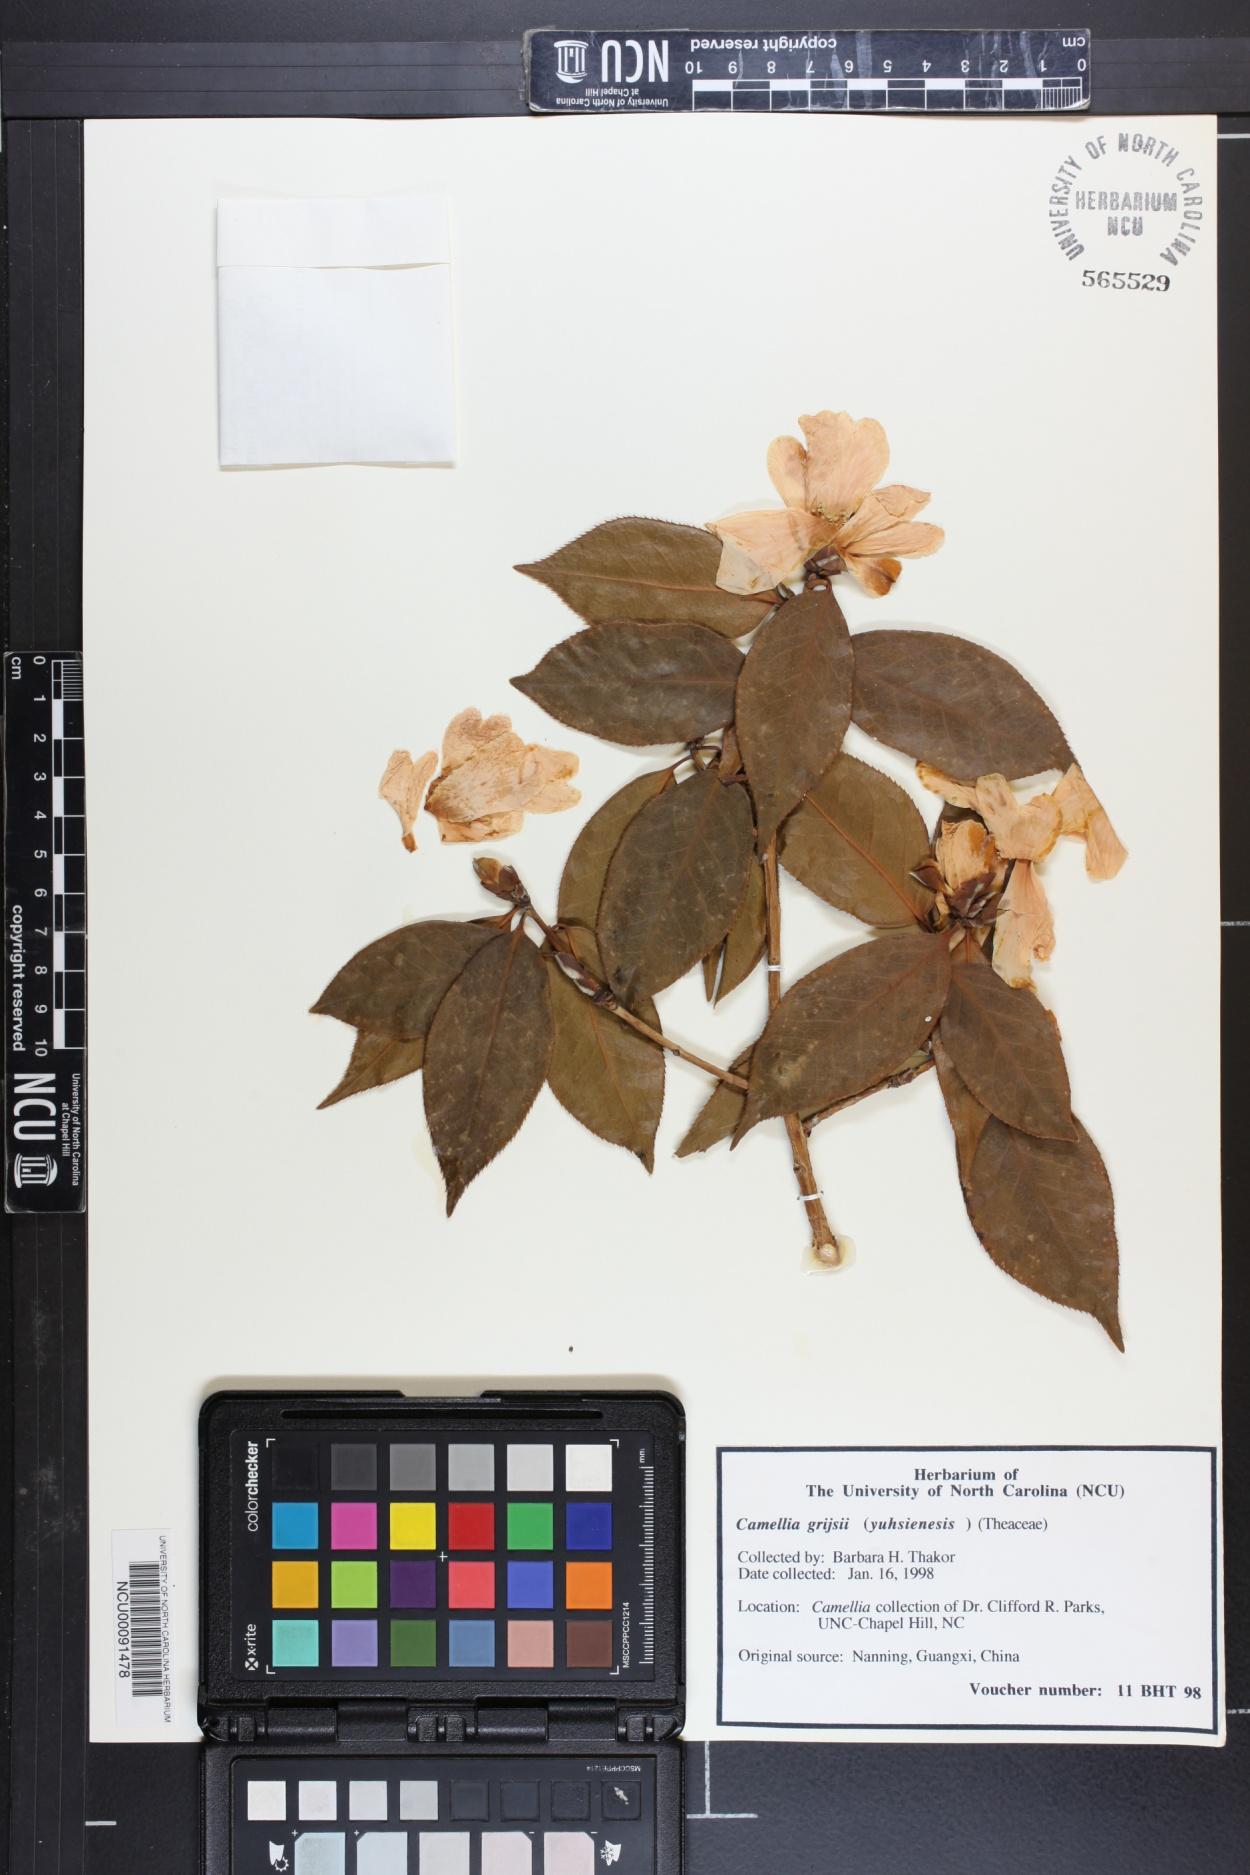 Camellia grijsii image